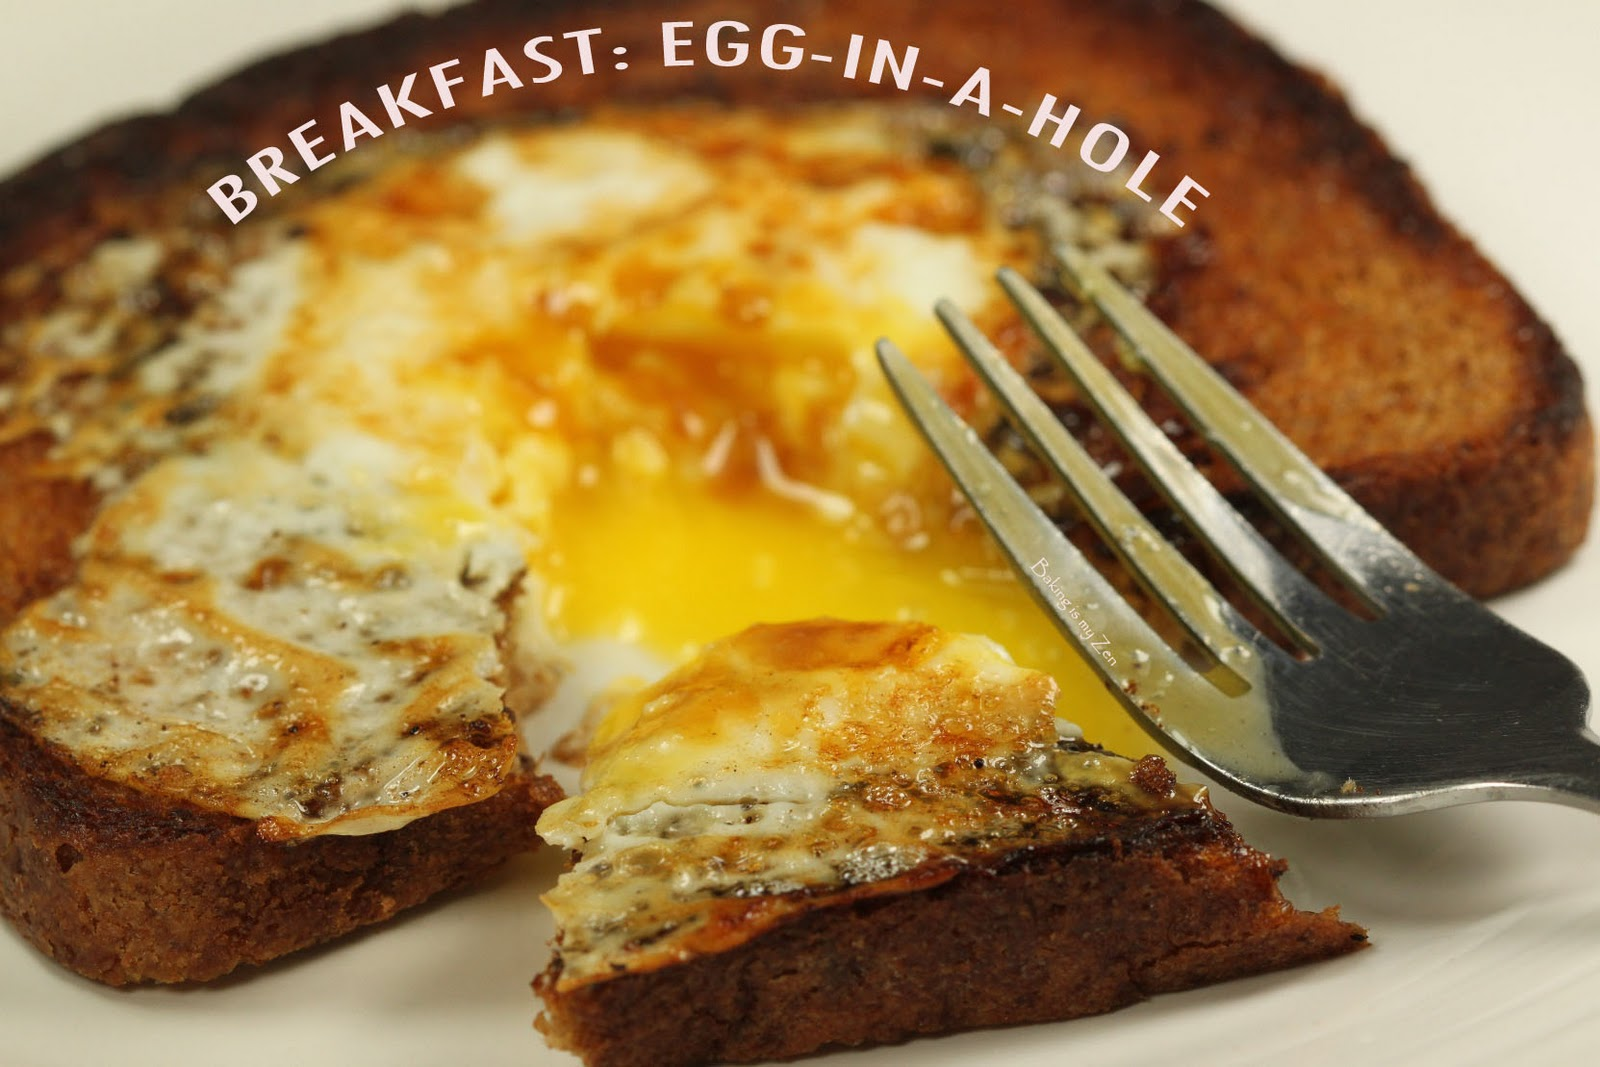 Baking is my Zen: Egg-in-a-Hole ~ Not Just For Breakfast